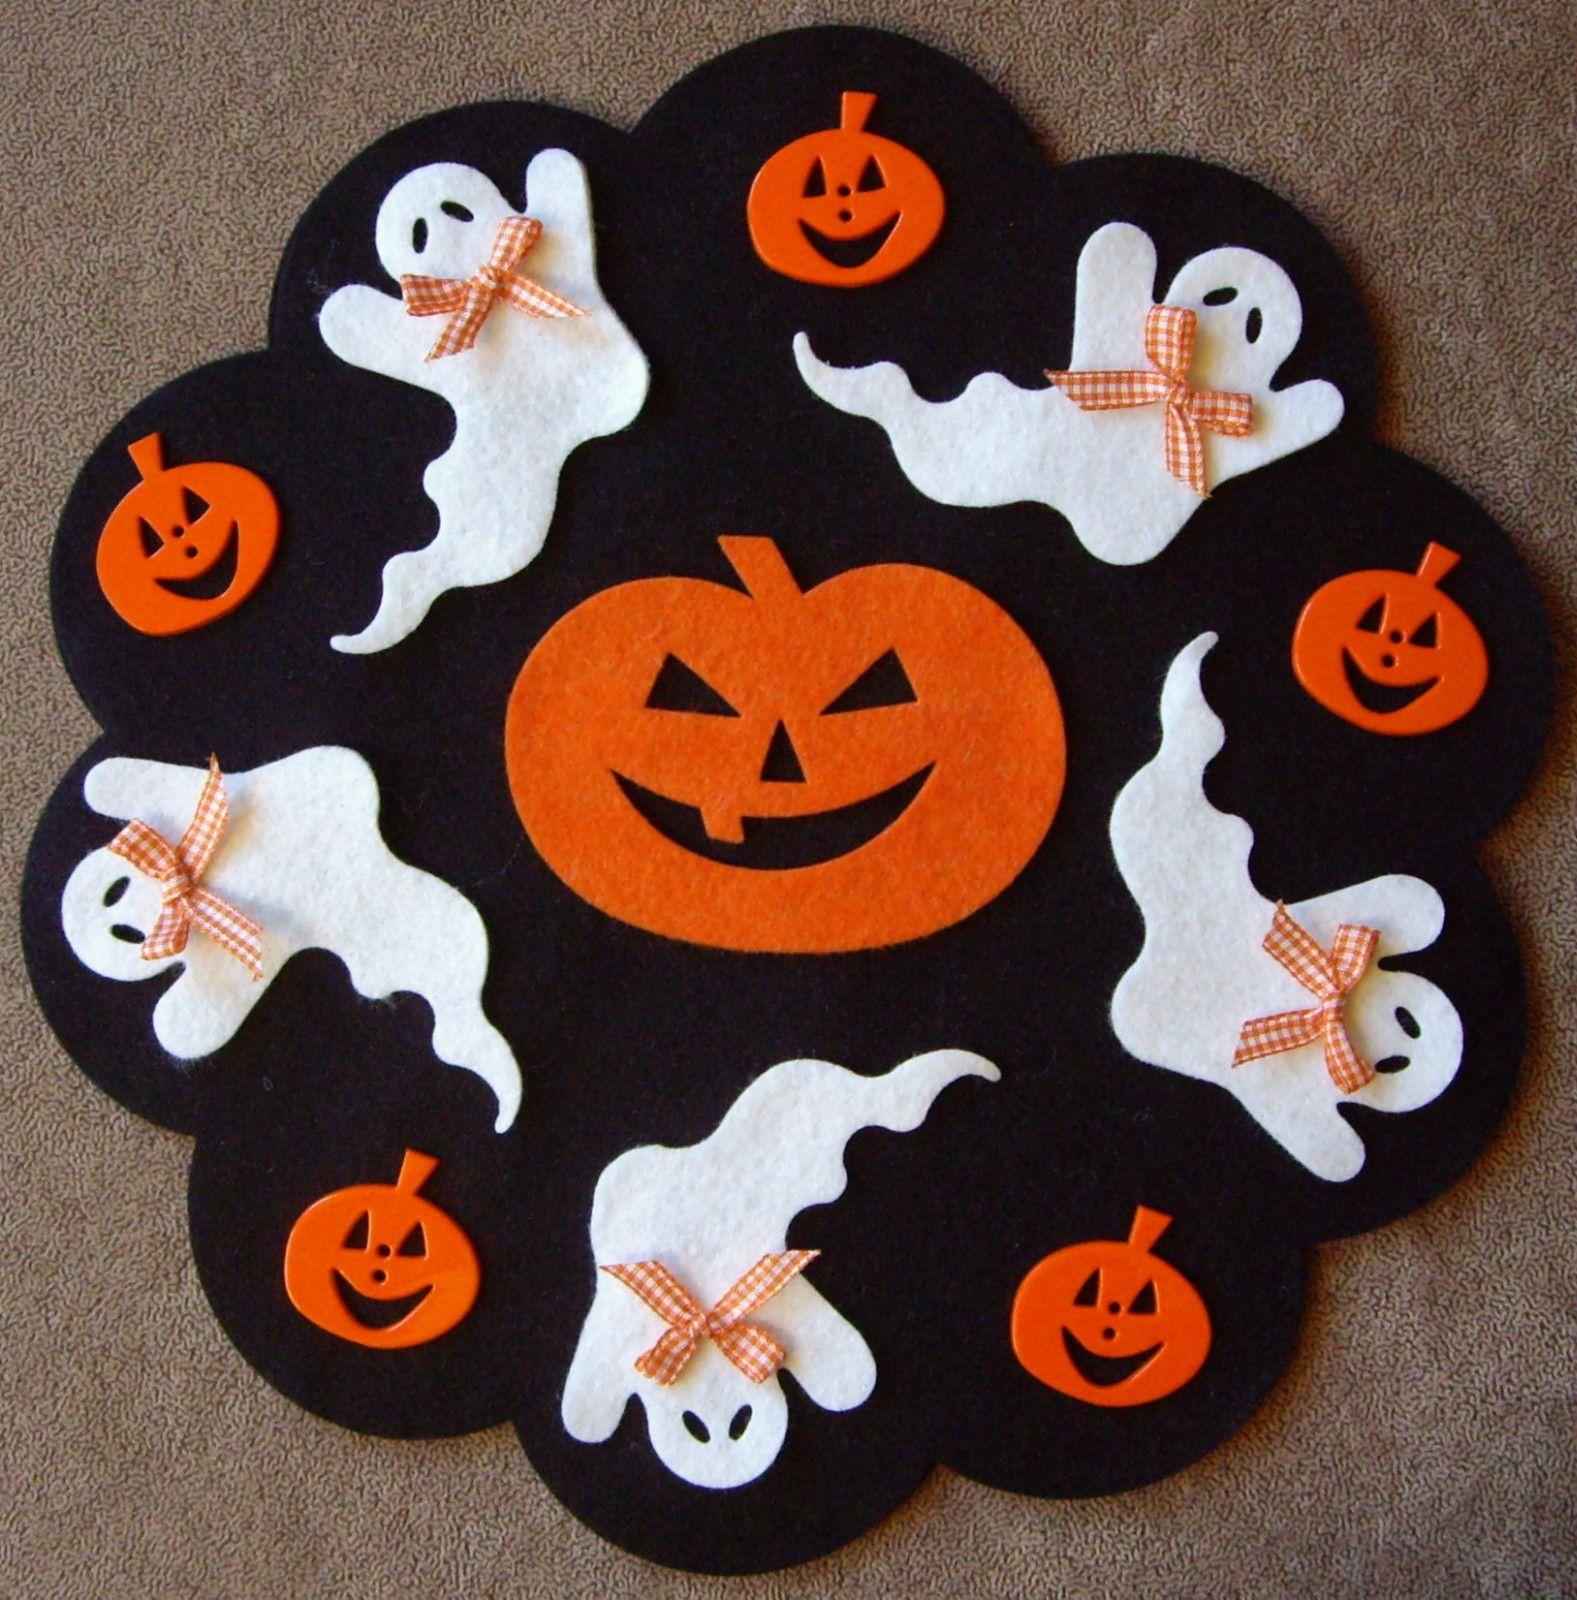 penny rugwool felt appliquewool appliqueprimitive you sew kit halloween - Halloween Rugs